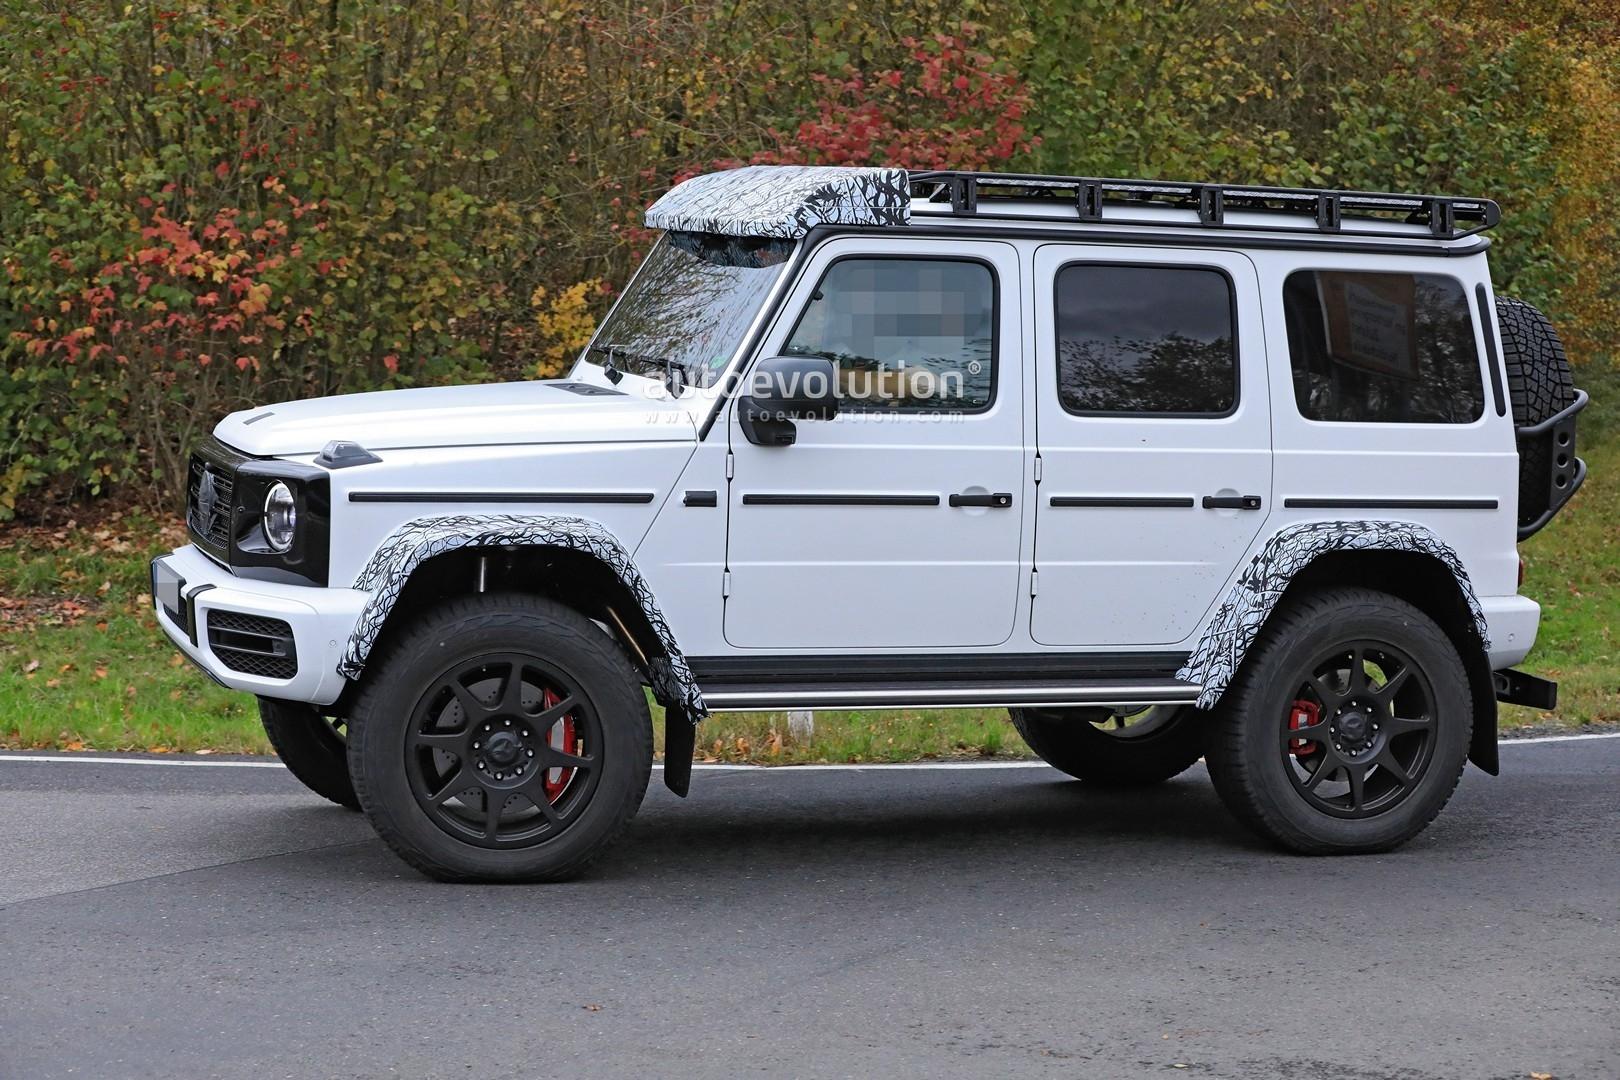 Mercedes-Benz G550 4×4² 2022 foto spia